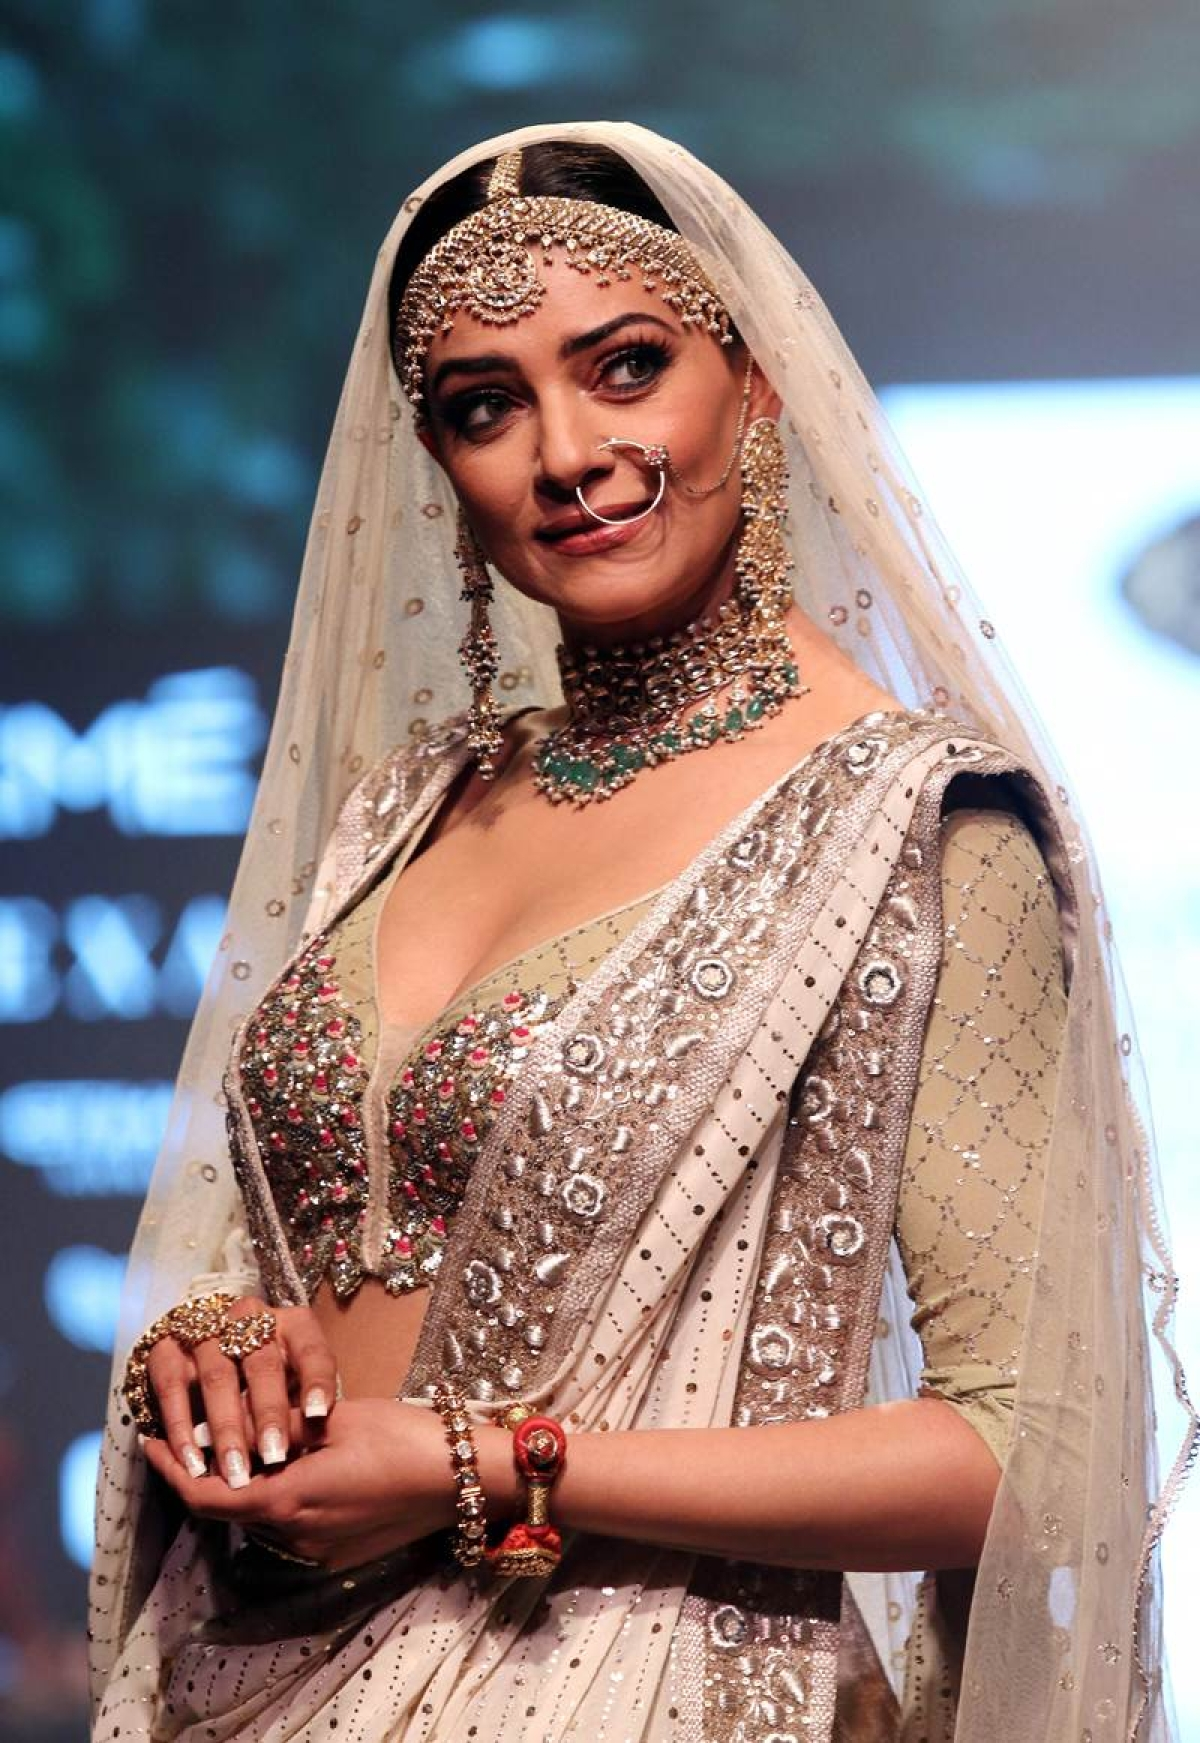 Lakme Fashion Week S R 2018 Highlights: Sushmita Sen walks to the tunes of 'Umrao Jaan'